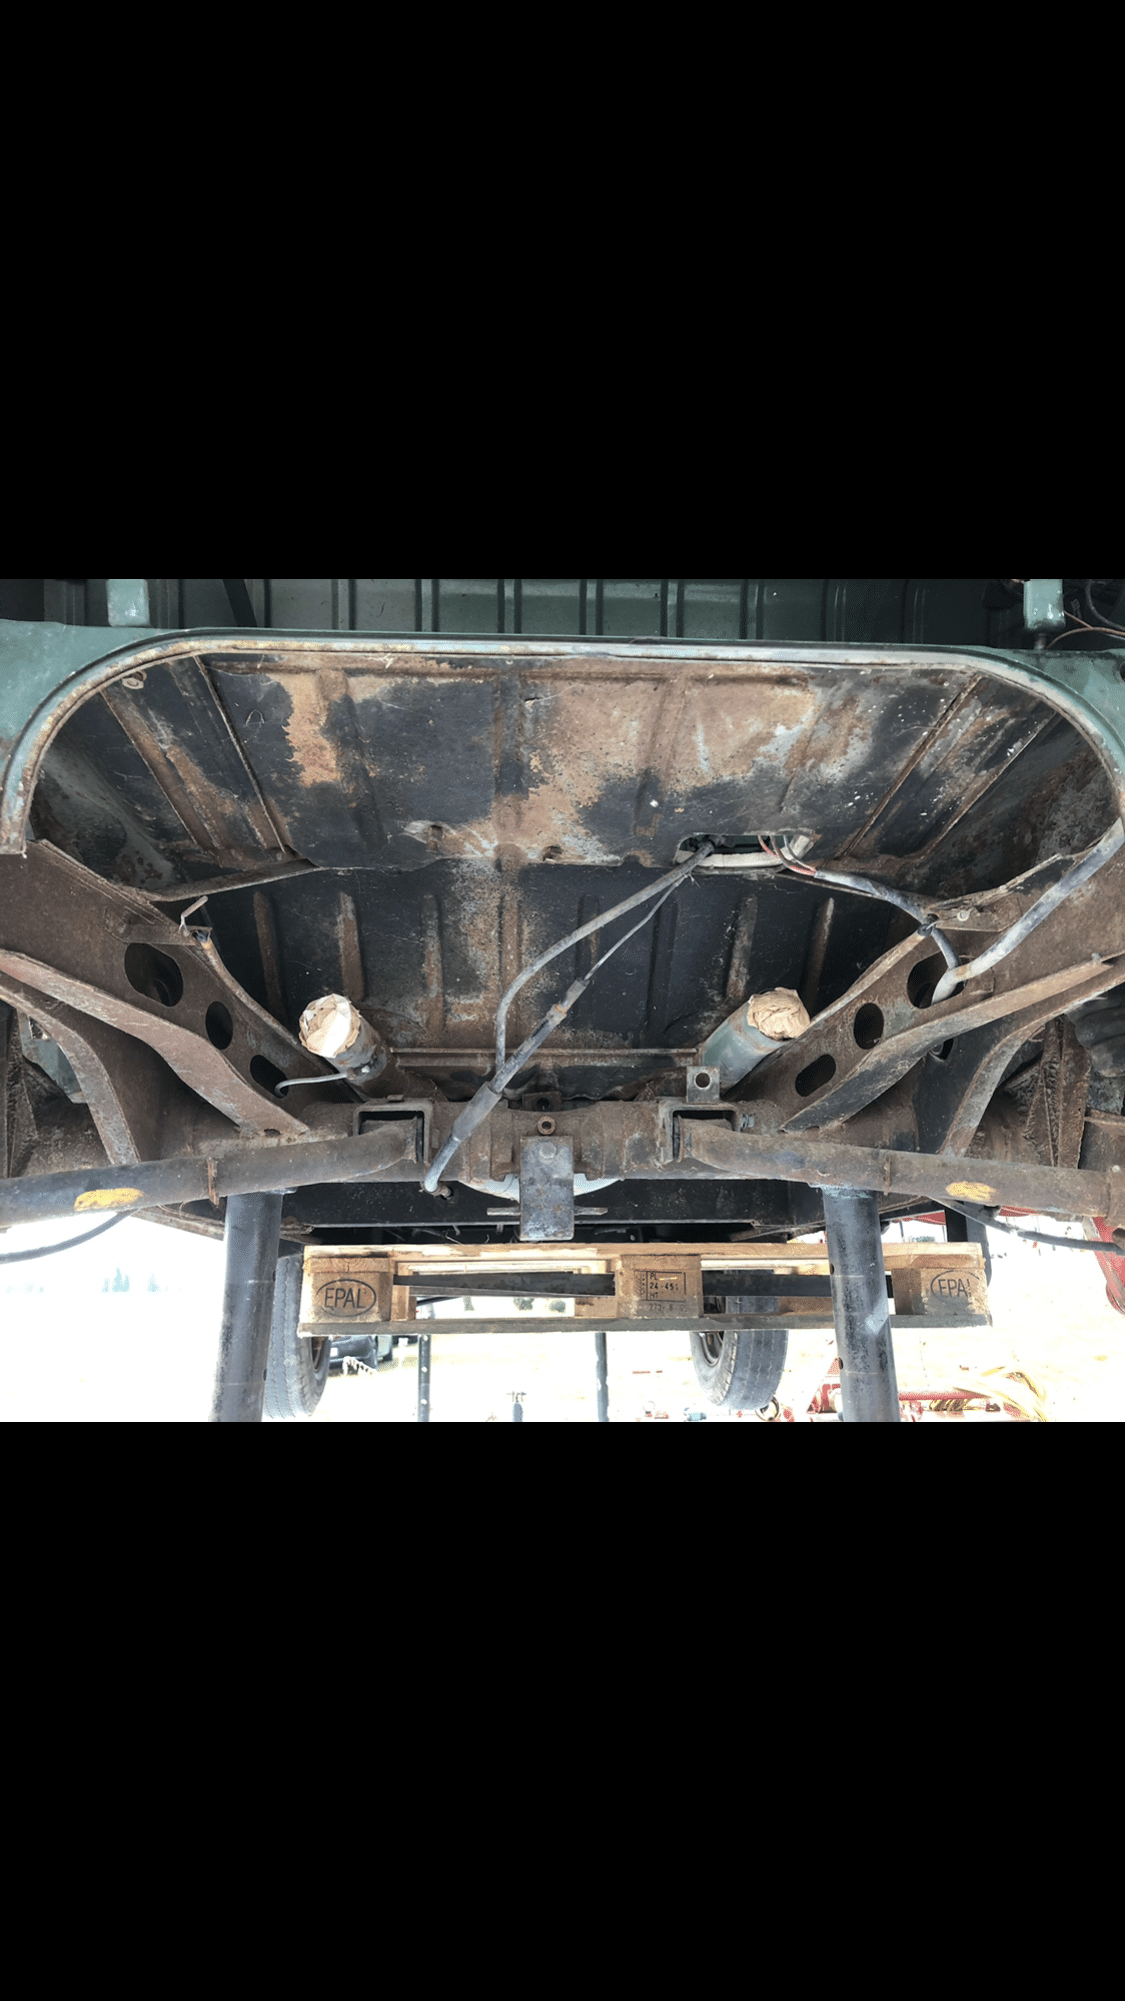 La corrosion à attaqué le chassis du bus